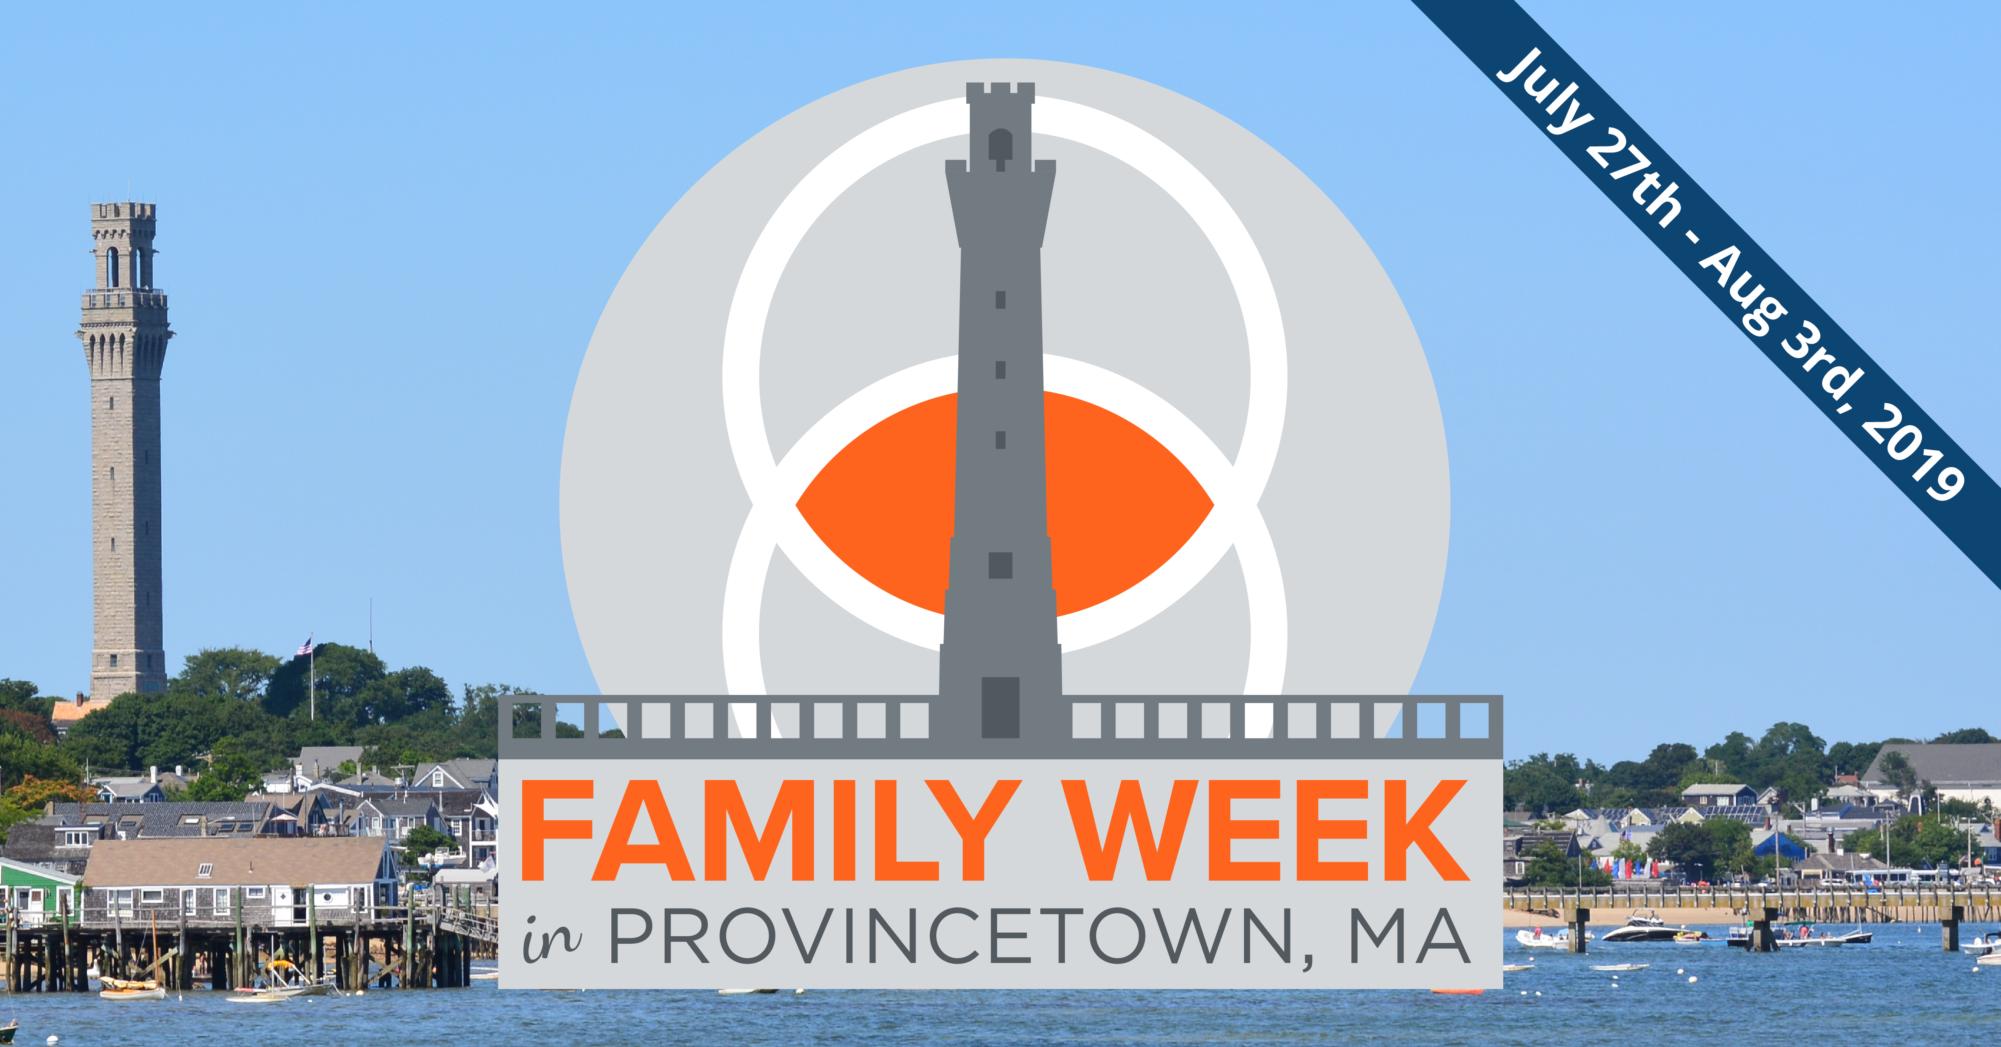 Family Week 2019